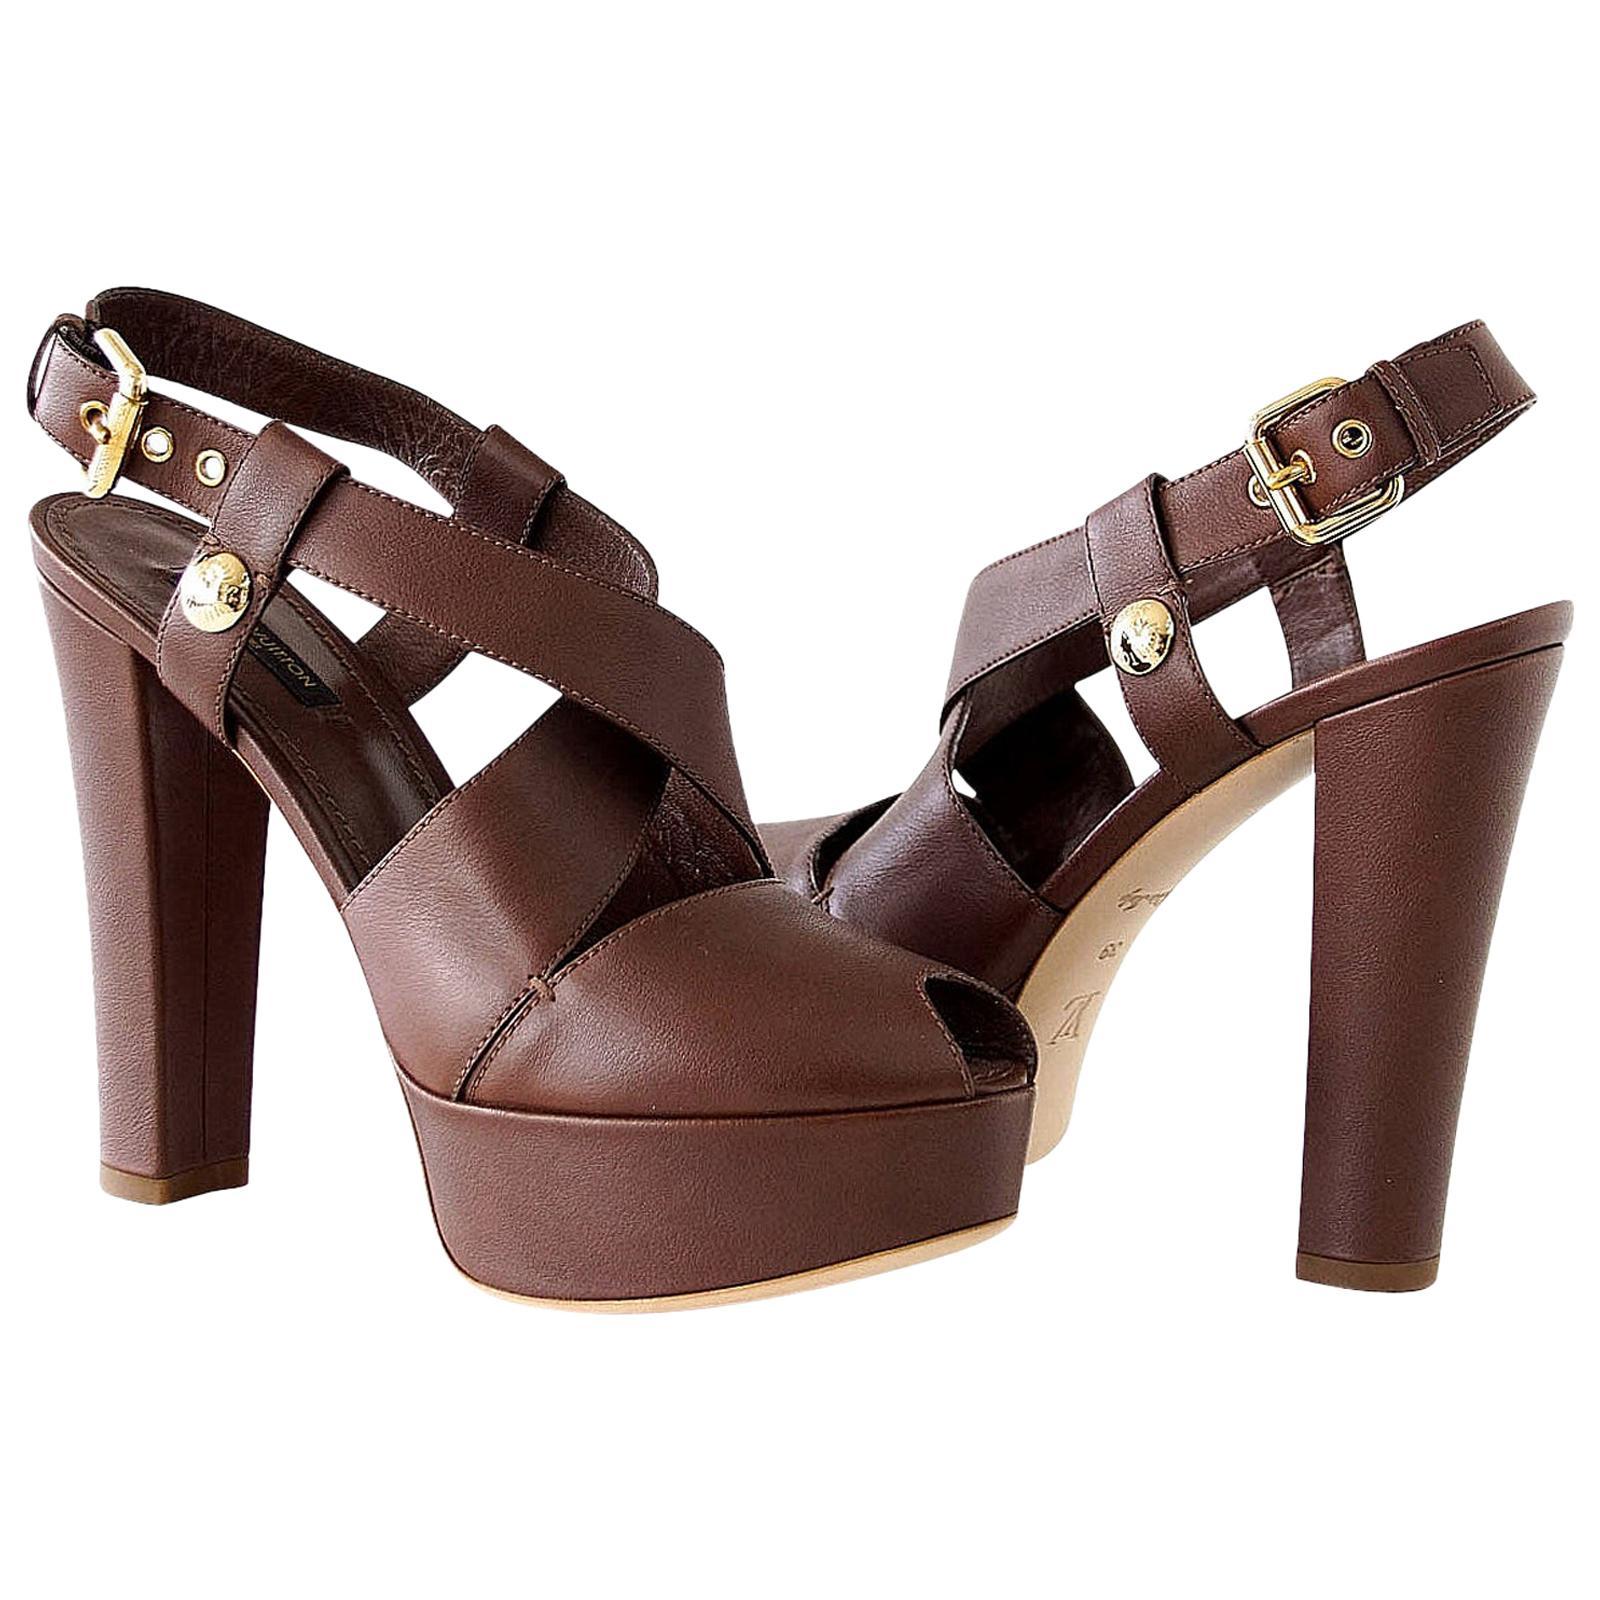 Louis Vuitton Shoe Bold Strap Peeptoe Platform  39 / 9  New